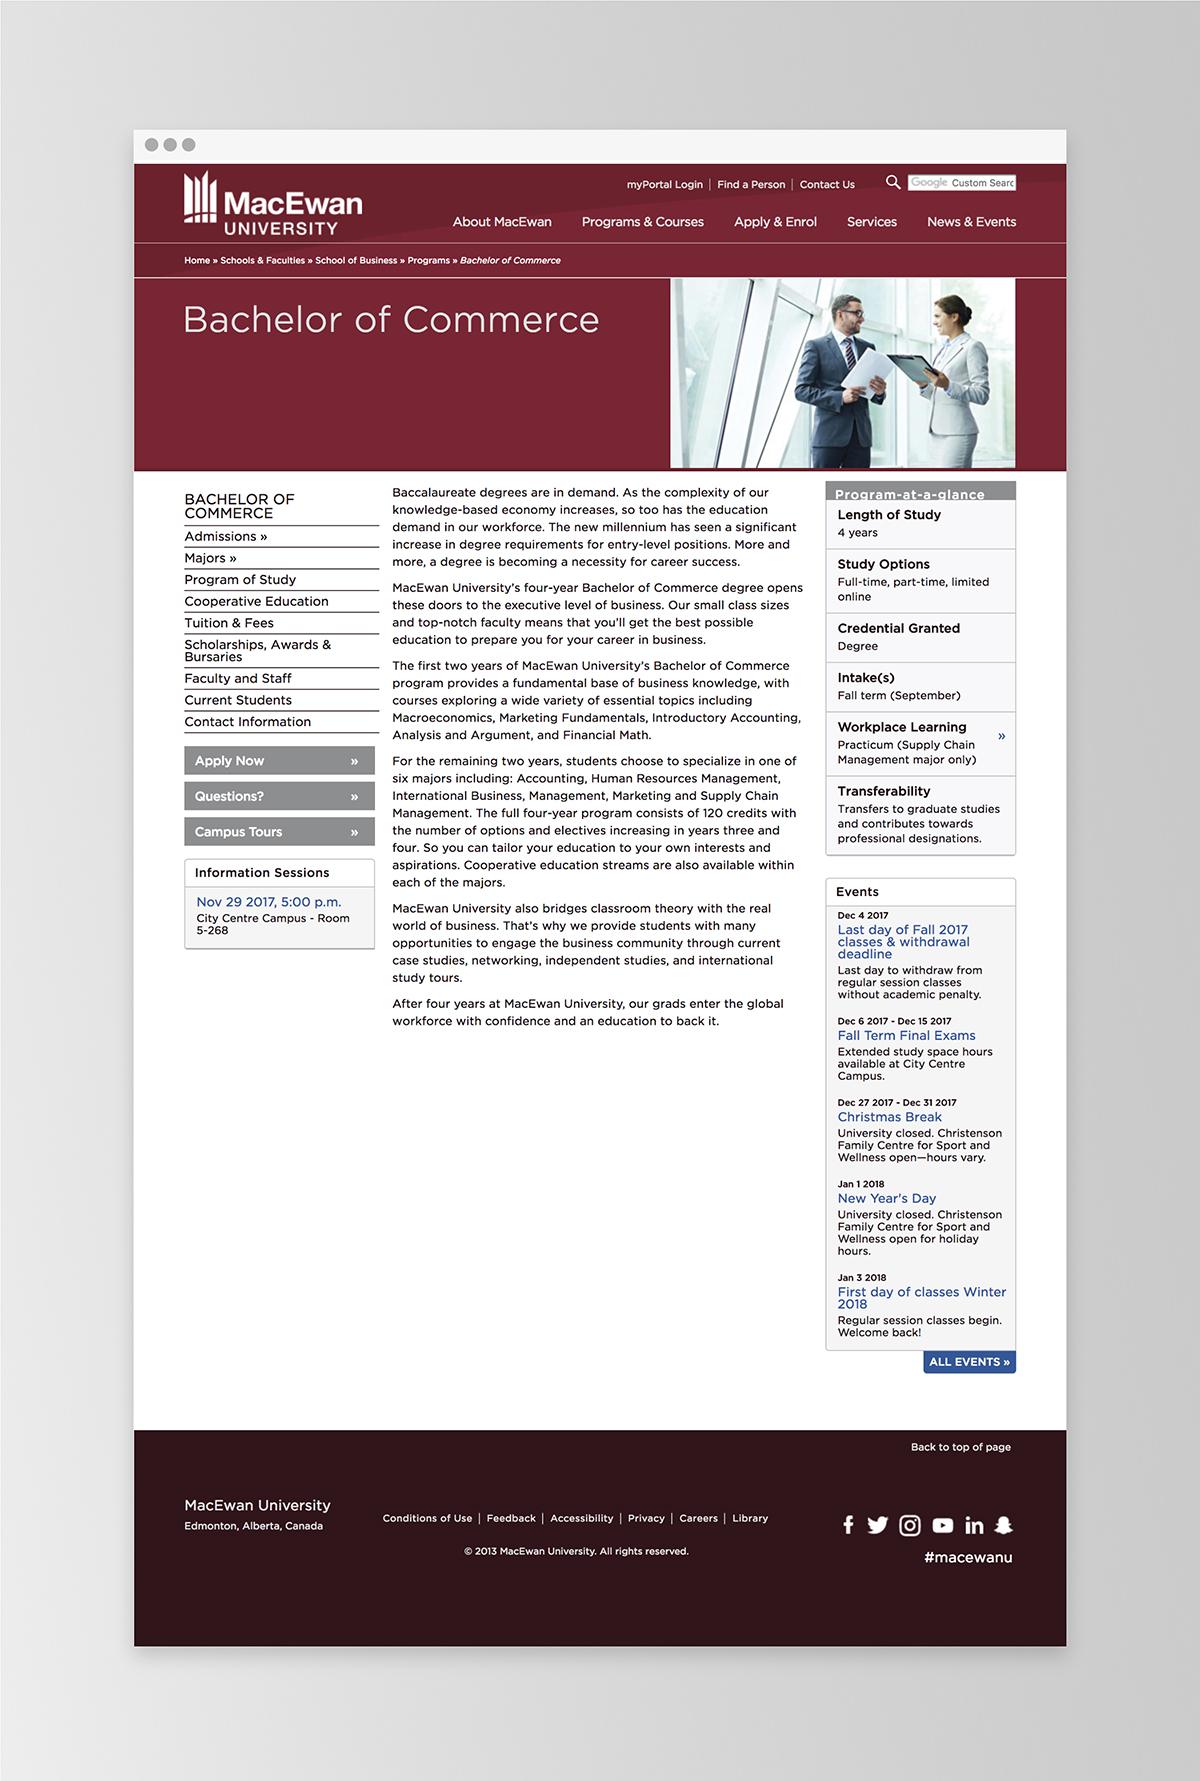 An example of the old MacEwan site template   MacEwan.ca/Commerce